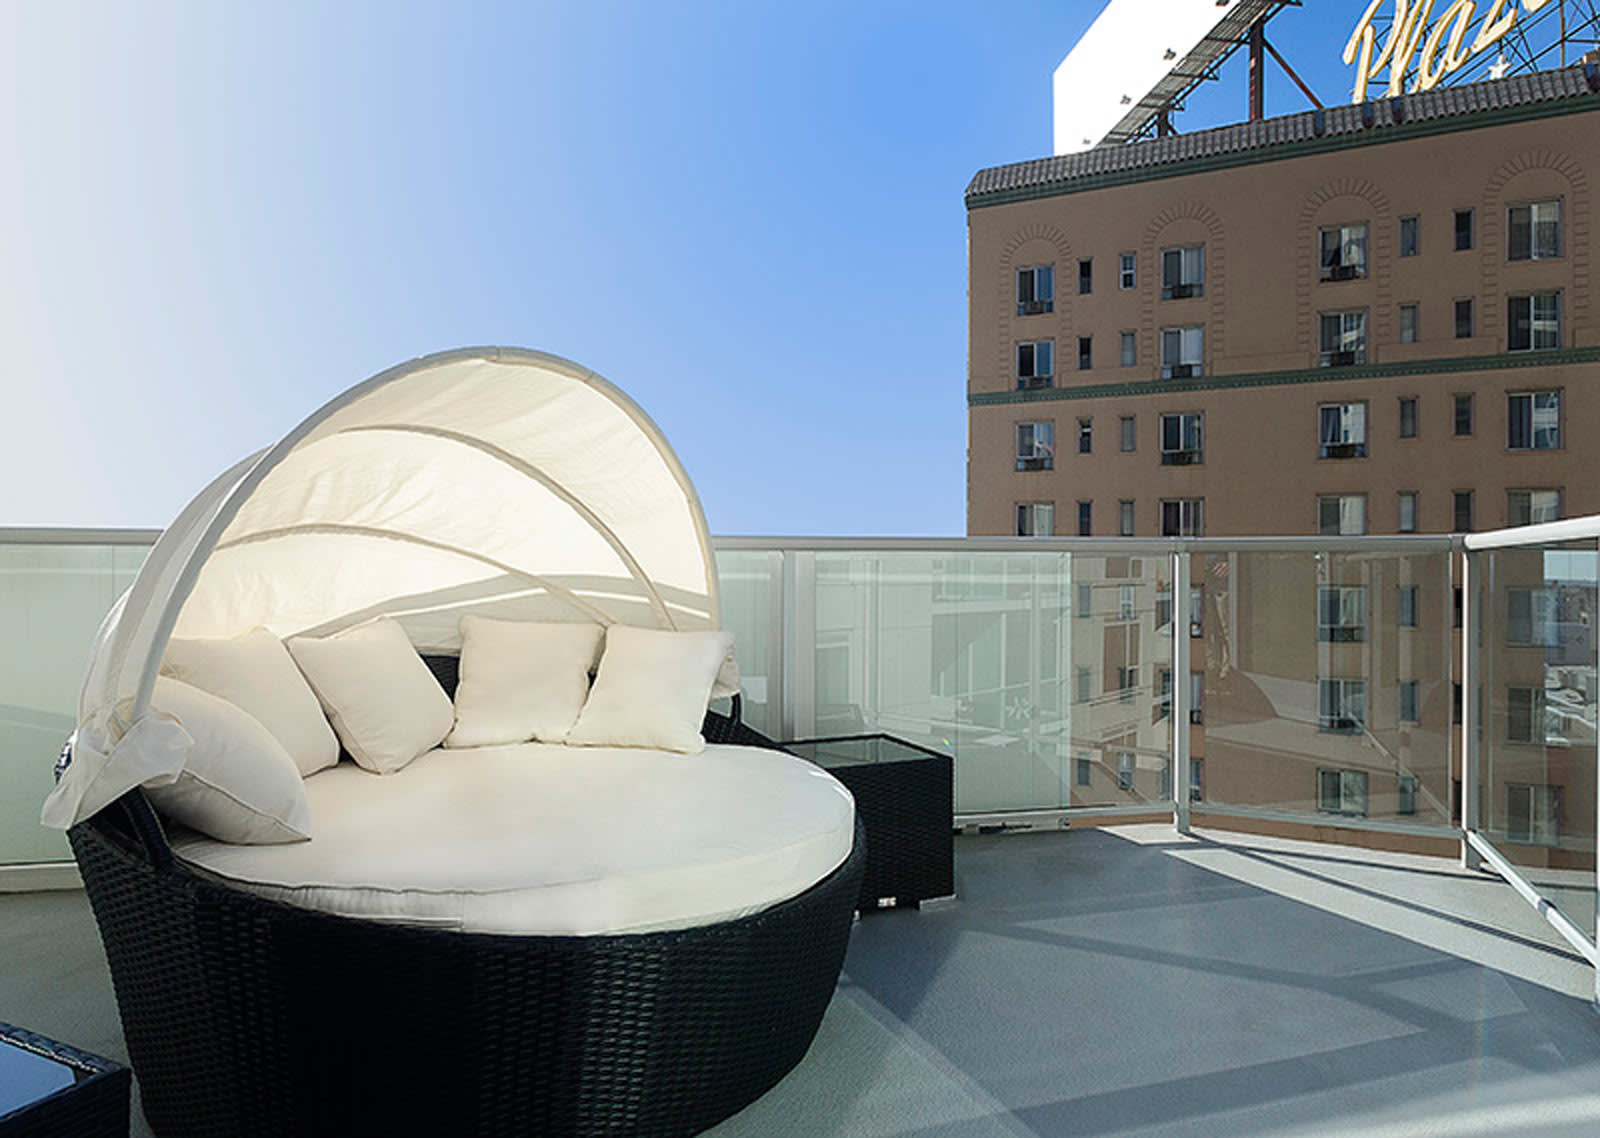 Screened Patio/Balcony at 1600 Vine Apartment Homes, 1600 VINE Street, Hollywood